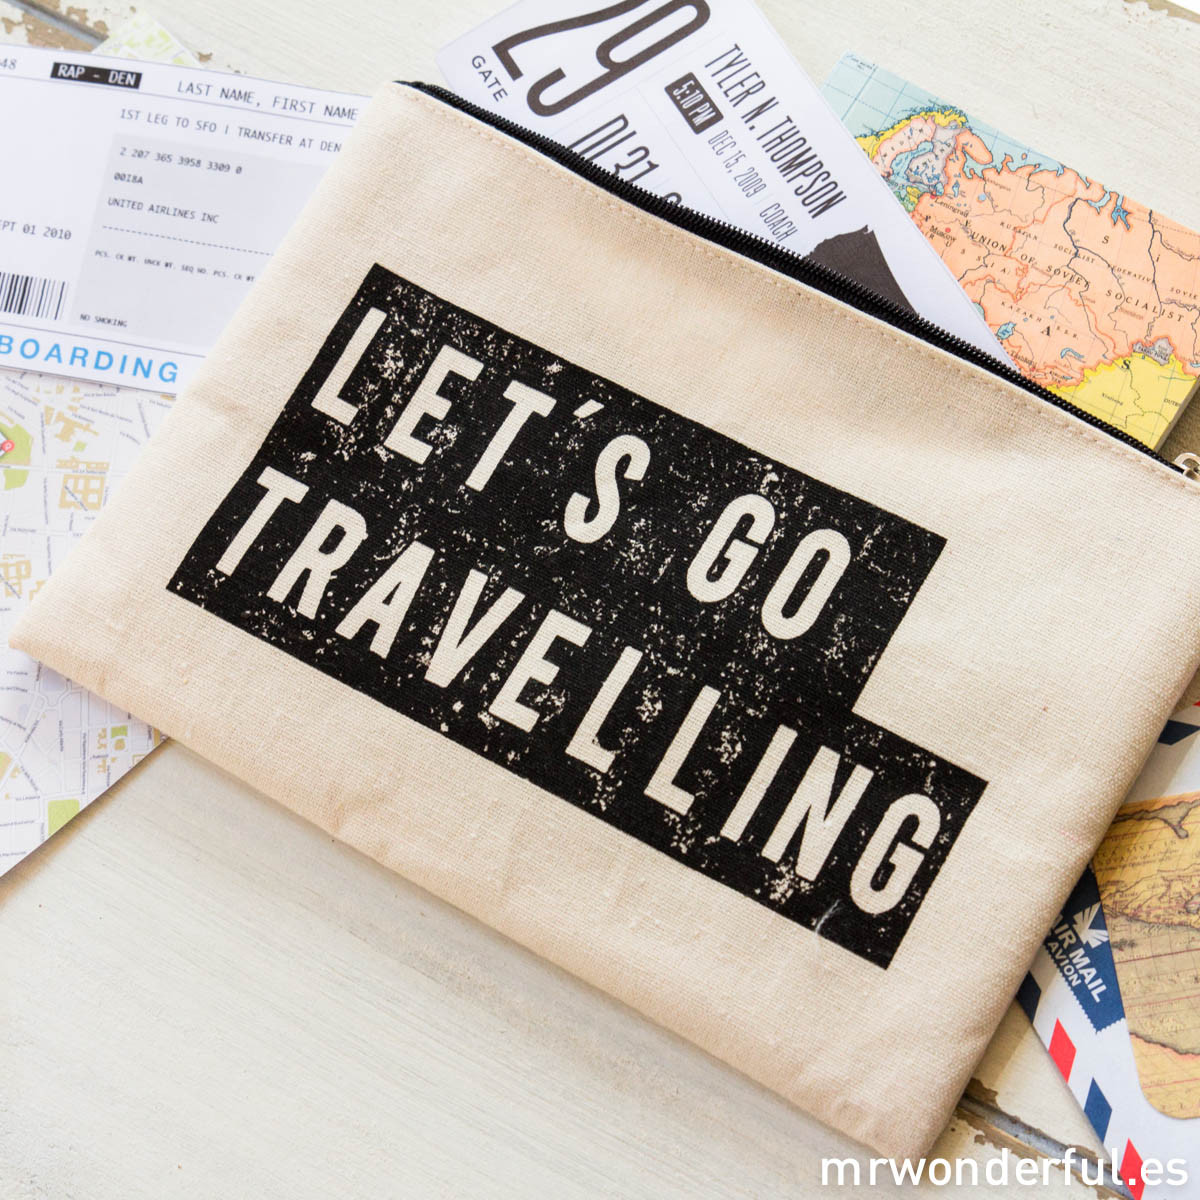 mrwonderful_LS0230_2_Neceser-tela-cremallera_lets-go-travelling-2